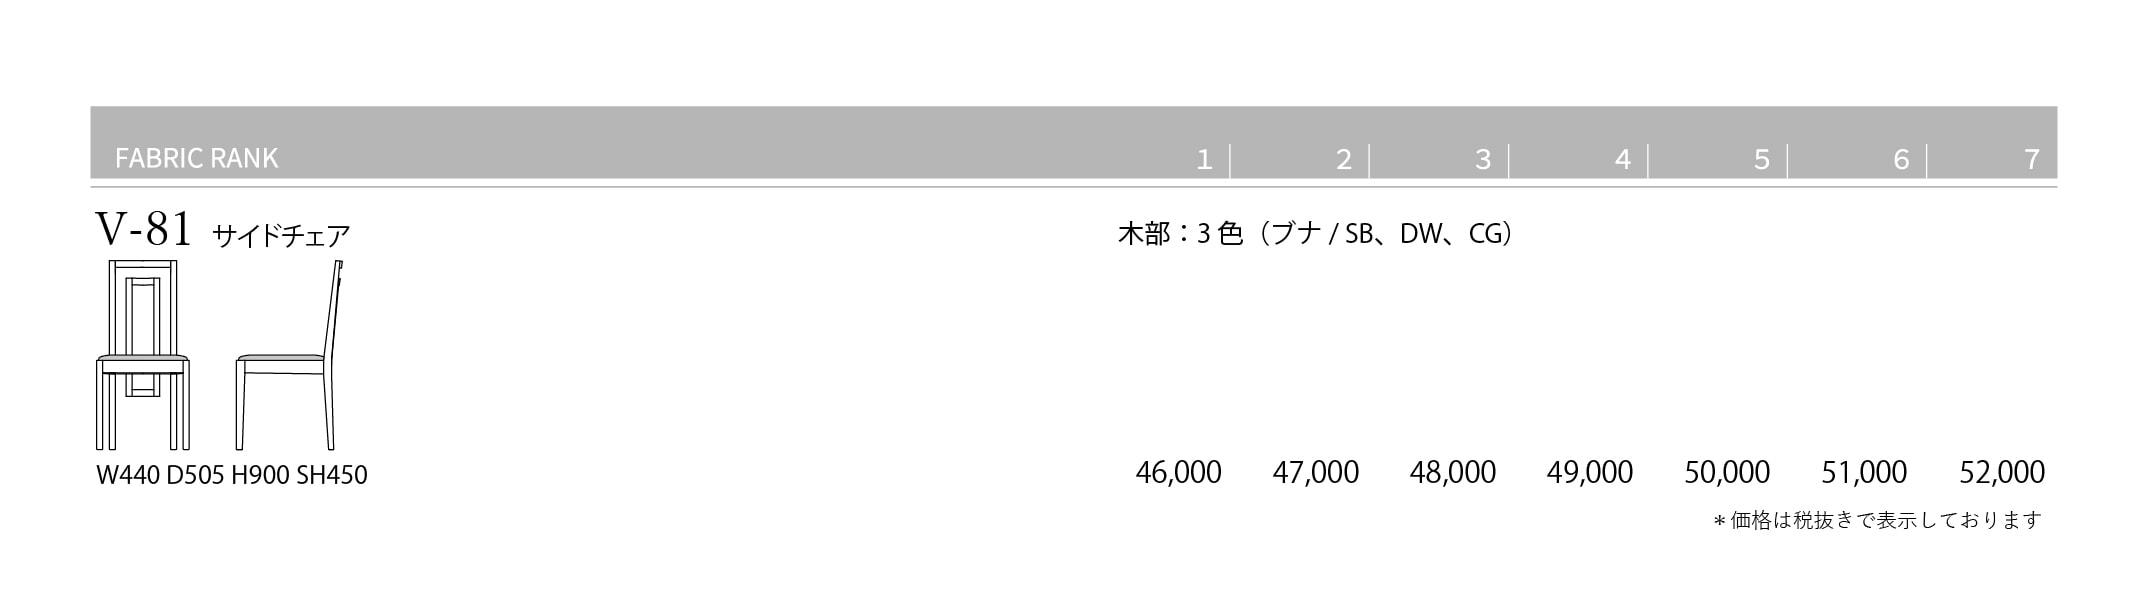 V-81 Price List